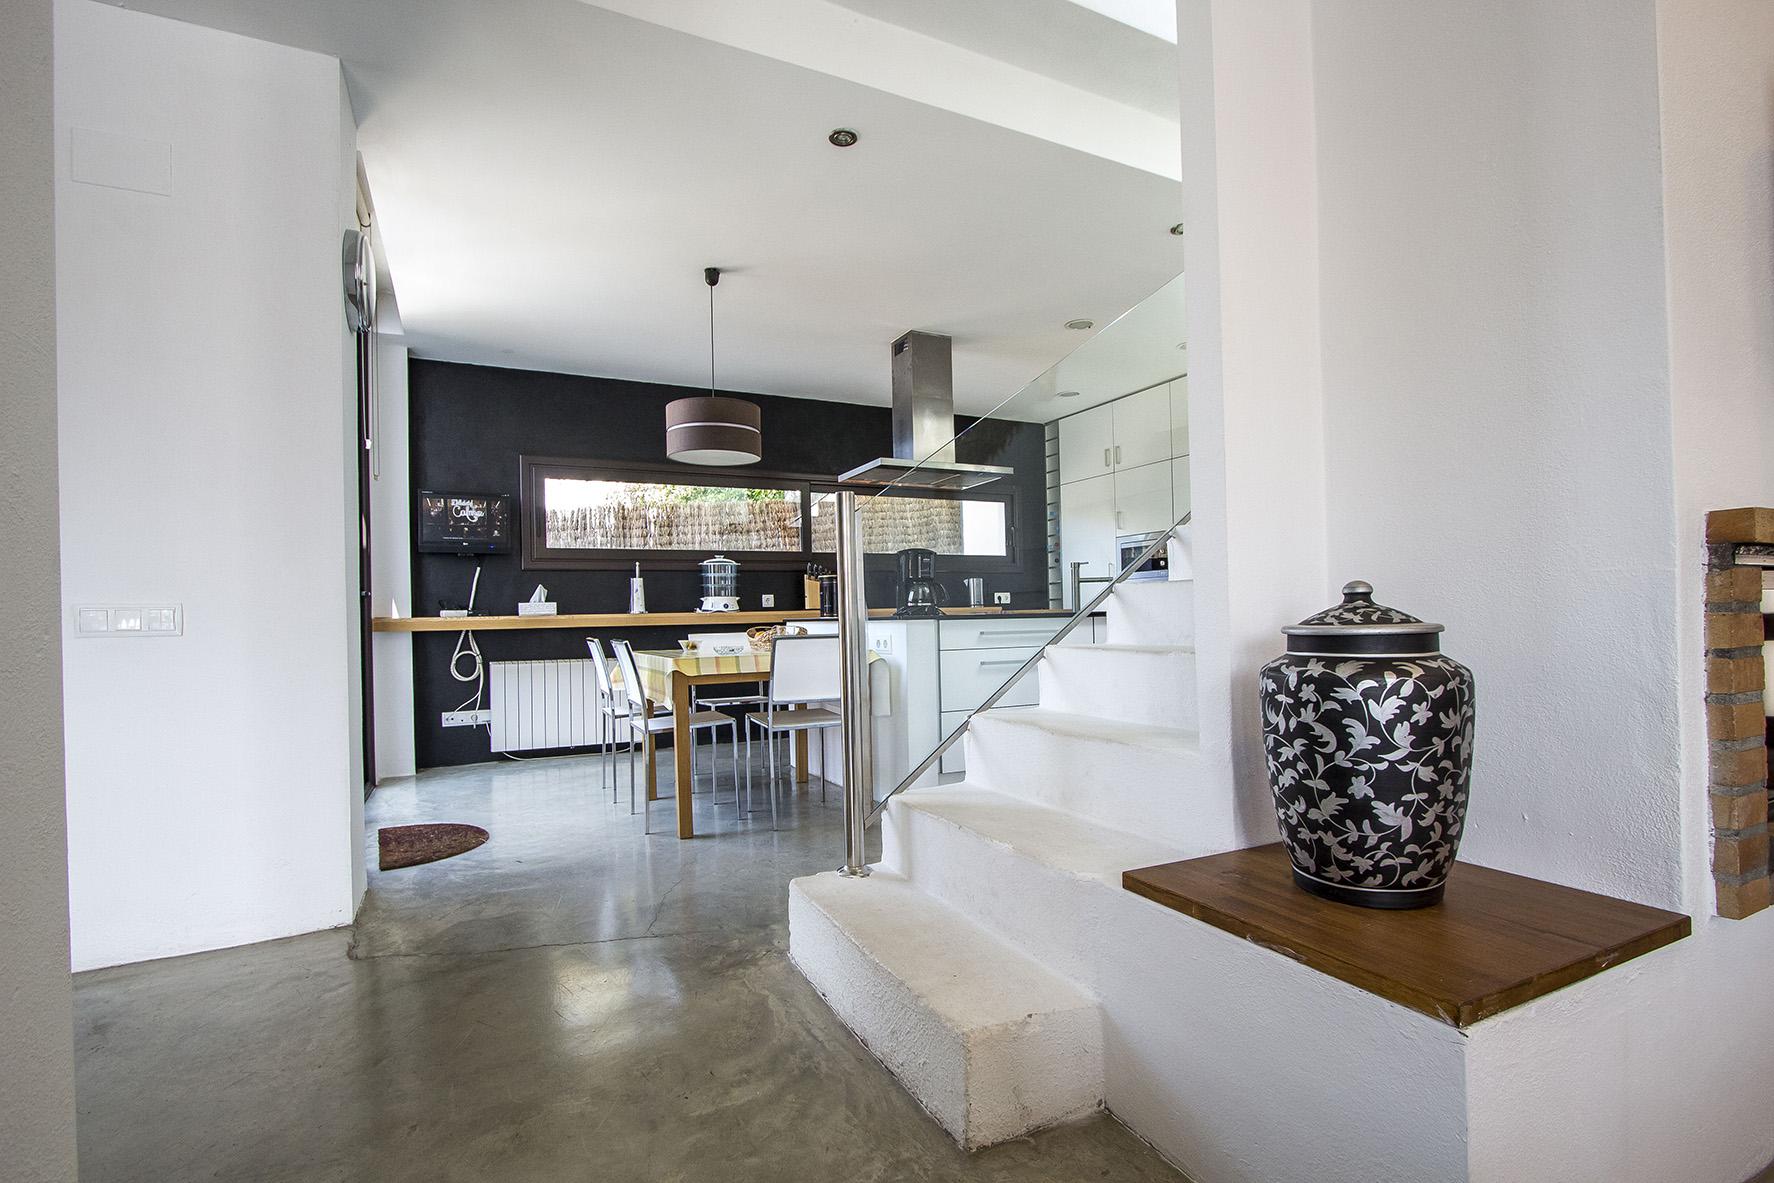 Ferienhaus Catalunya Casas: Serene villa in Sils, 20 km to Costa Brava beaches! (1890922), Les Mallorquines, Girona, Katalonien, Spanien, Bild 20